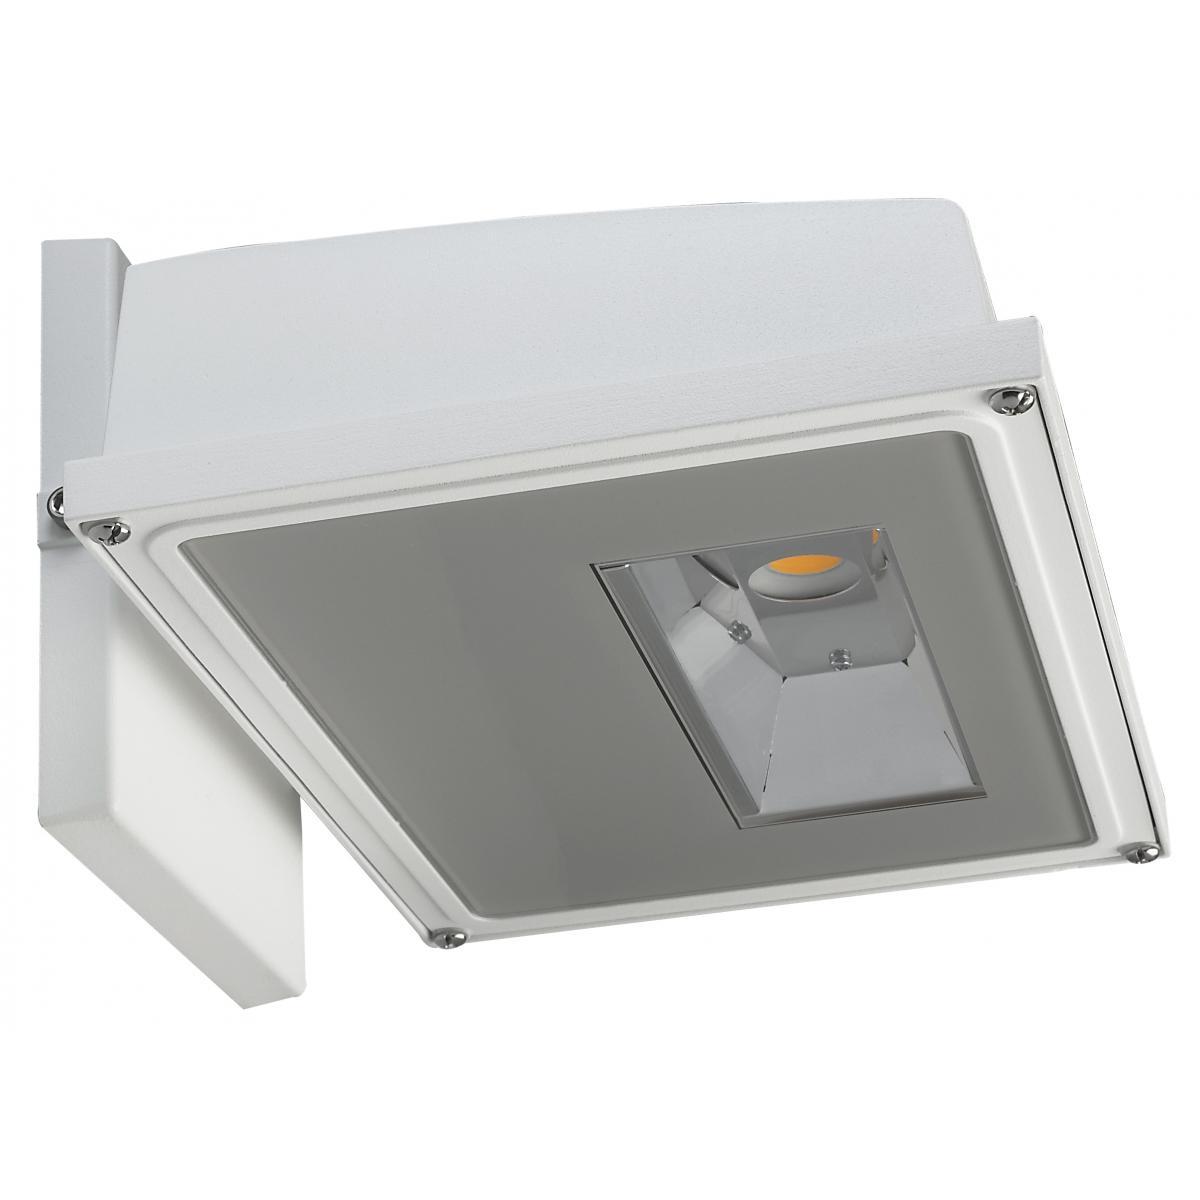 65-157 15W LED WALL PACK WHITE 3000K